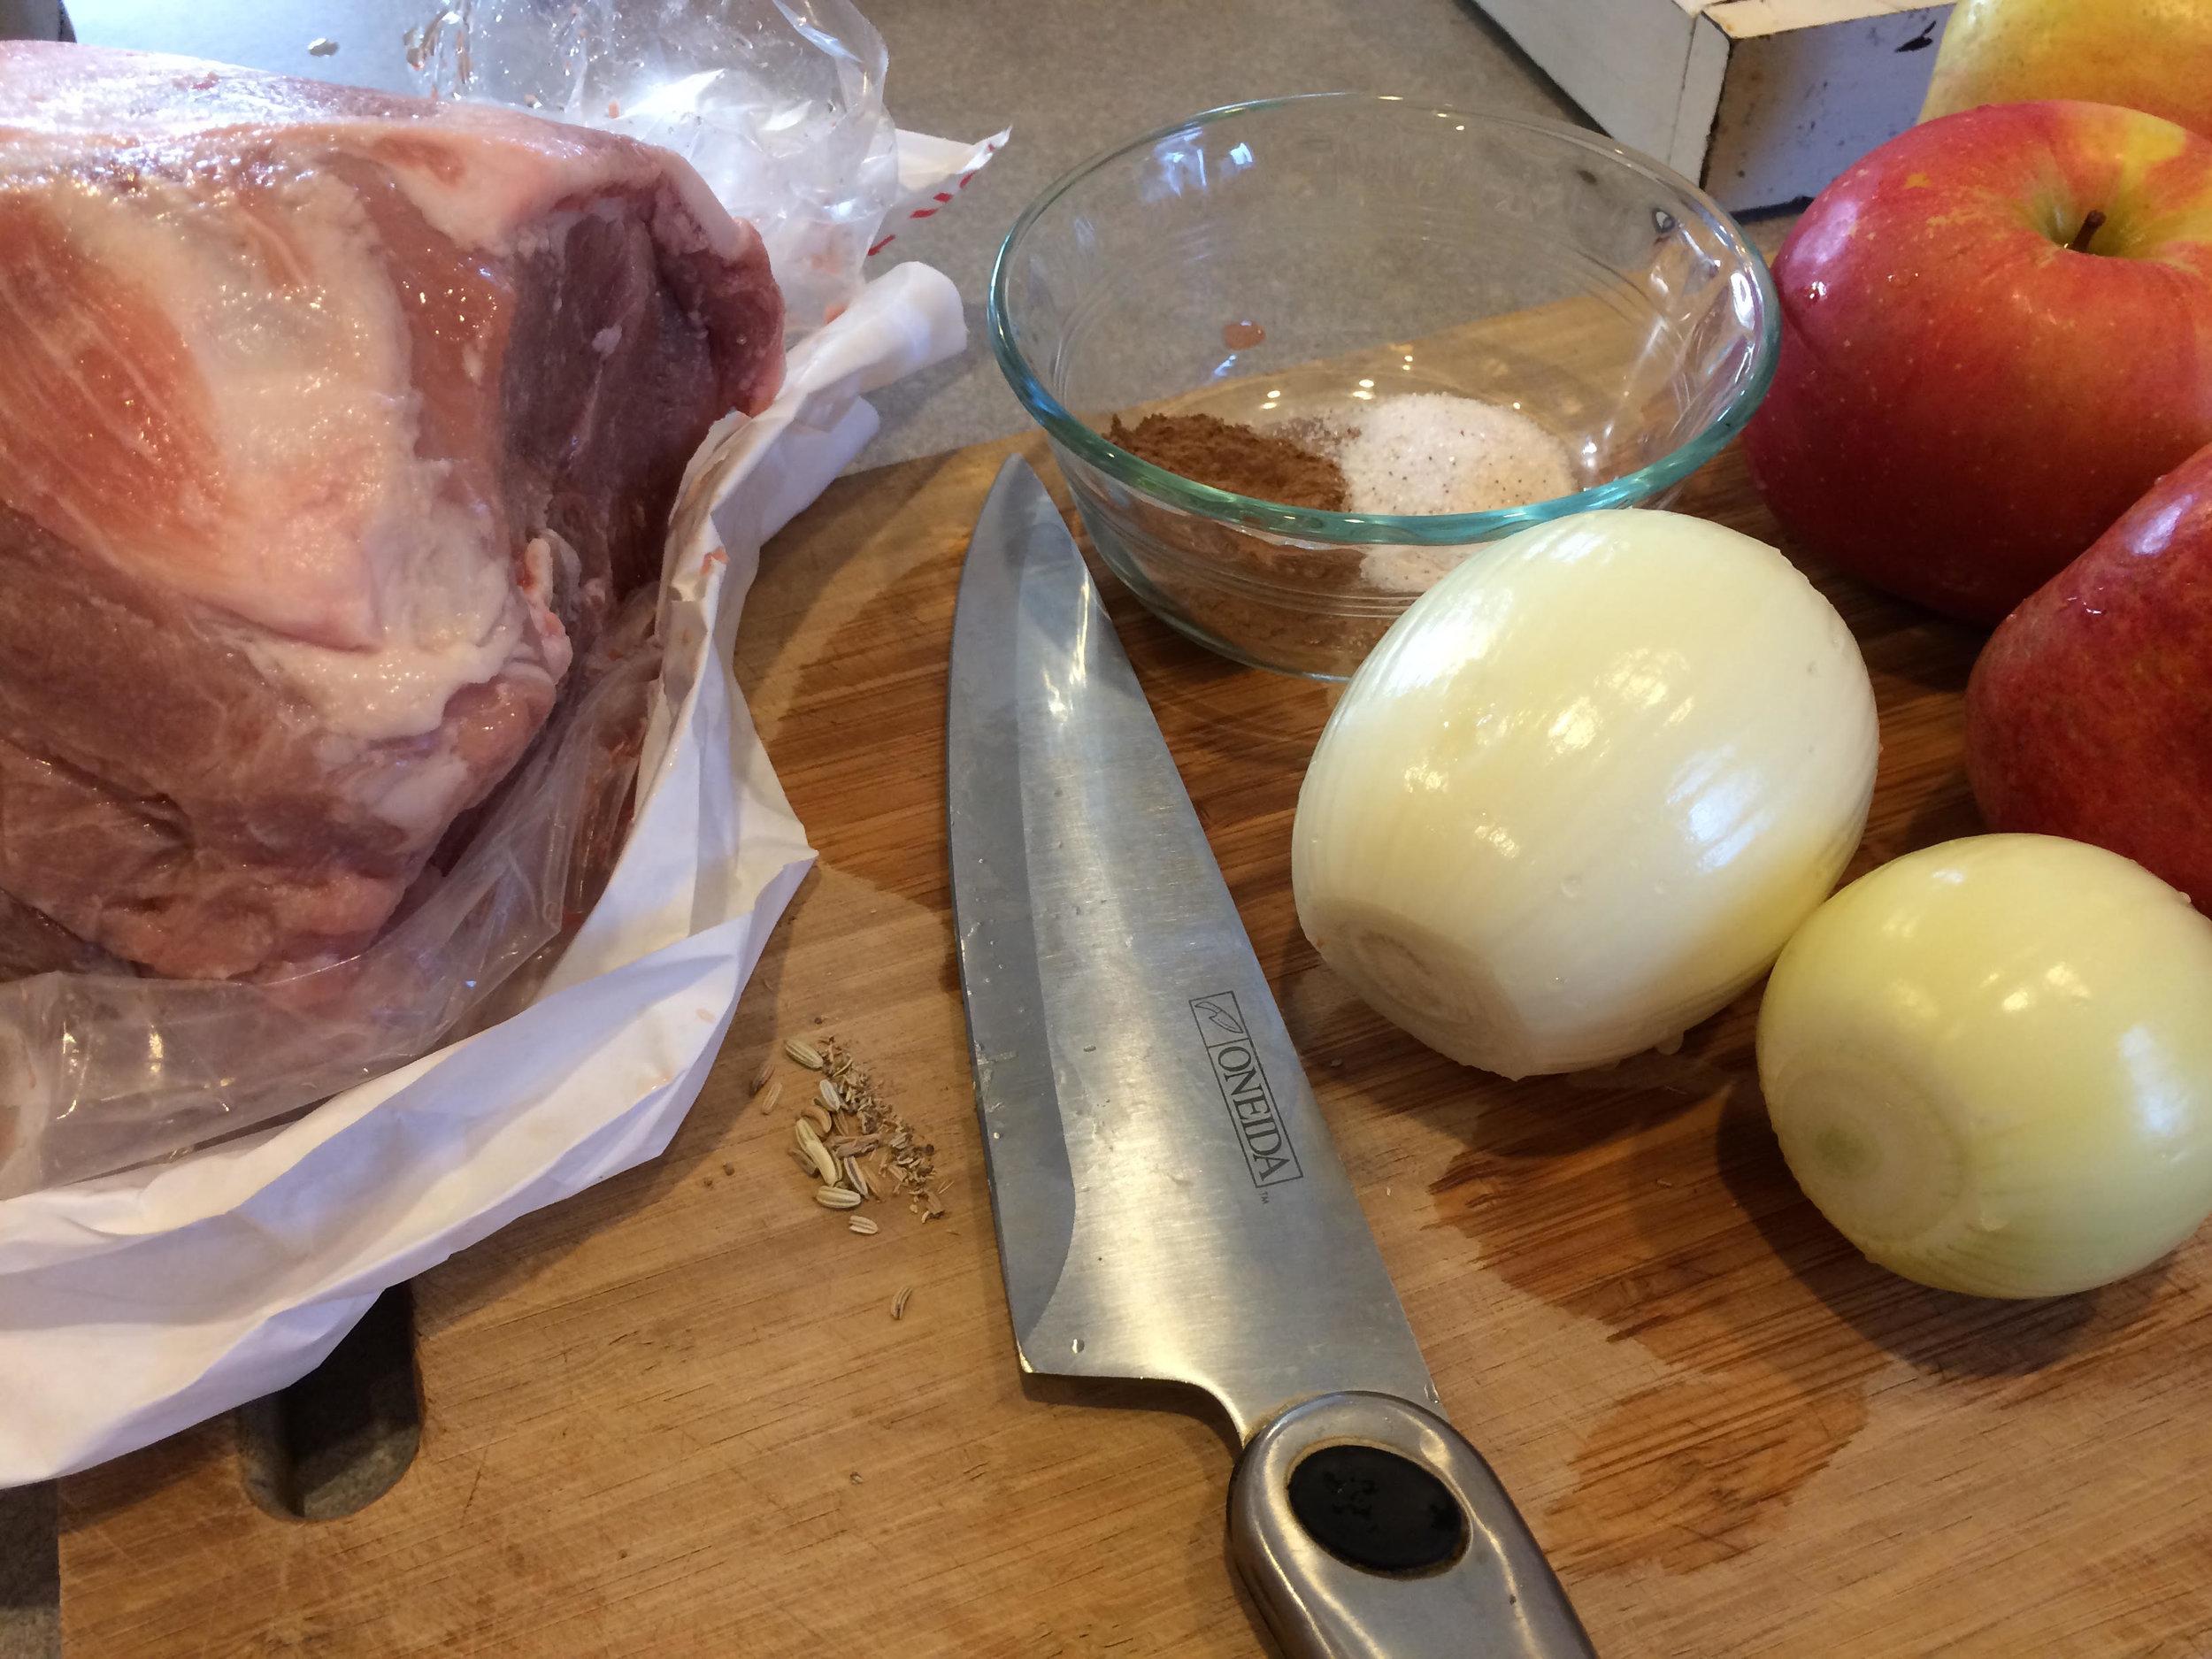 crock pot apples and onions pork 1.jpg